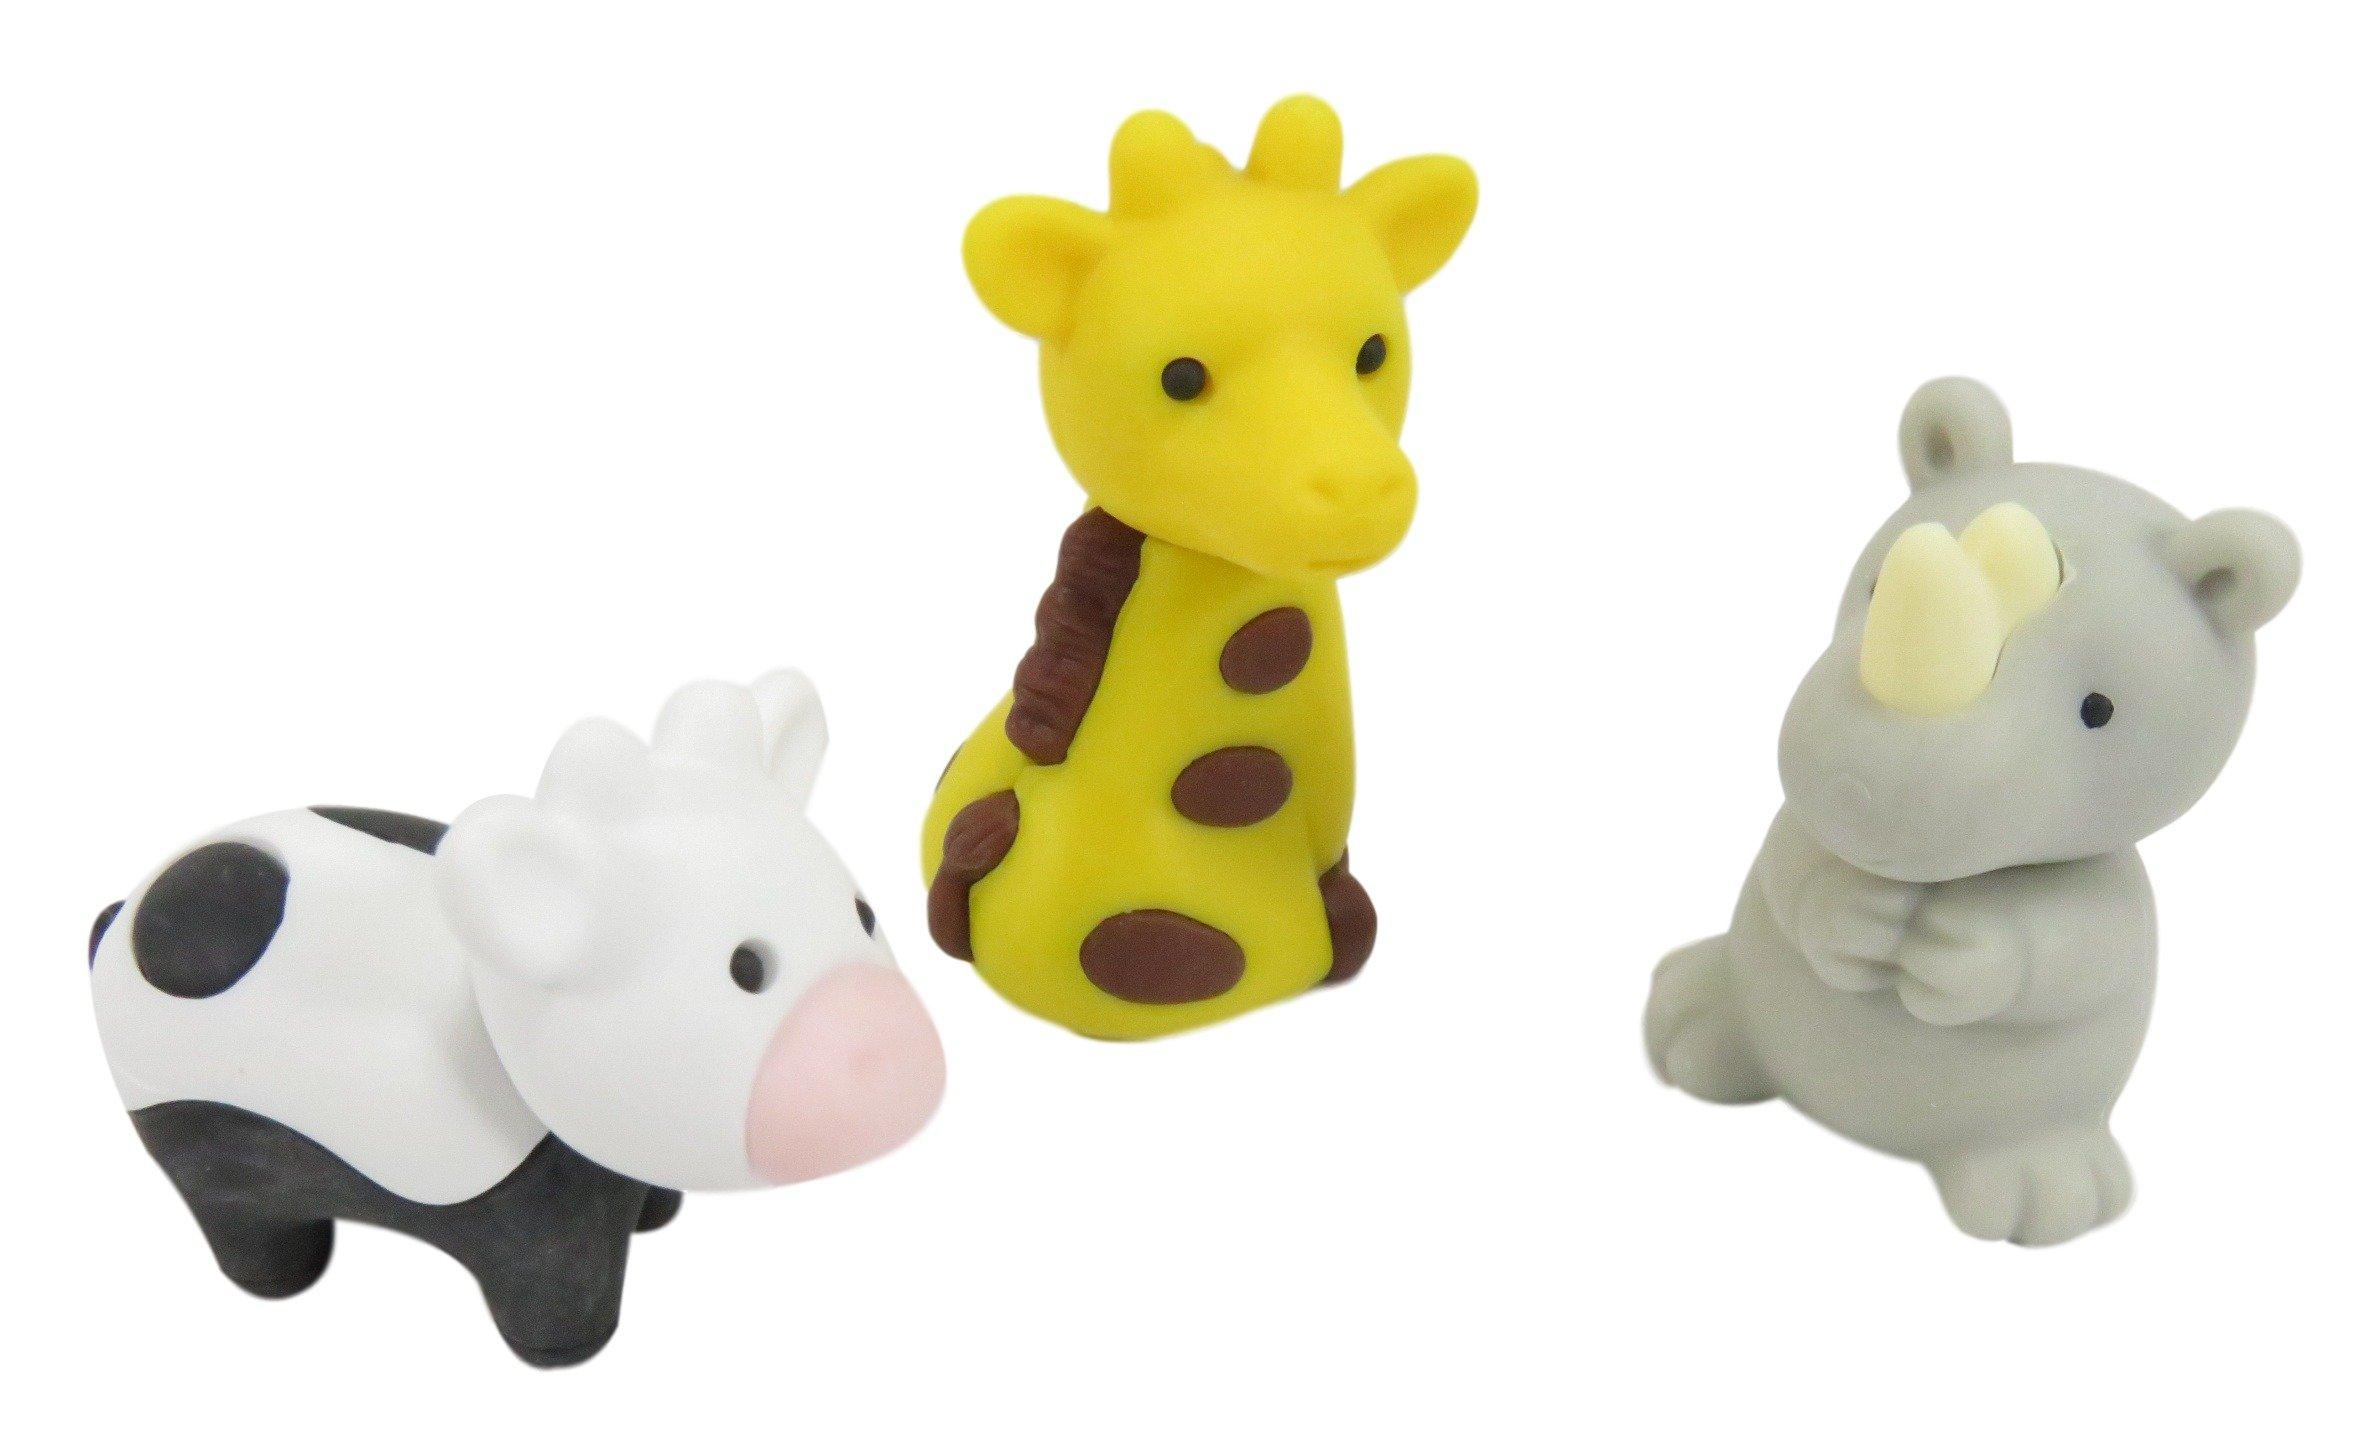 Take Apart Complete Your Collection Mini Erasers Gorilla Giraffe Polar Bear Rhino Kangaroo Pig Cow (Pack of 12) by Daiso Japan (Image #3)